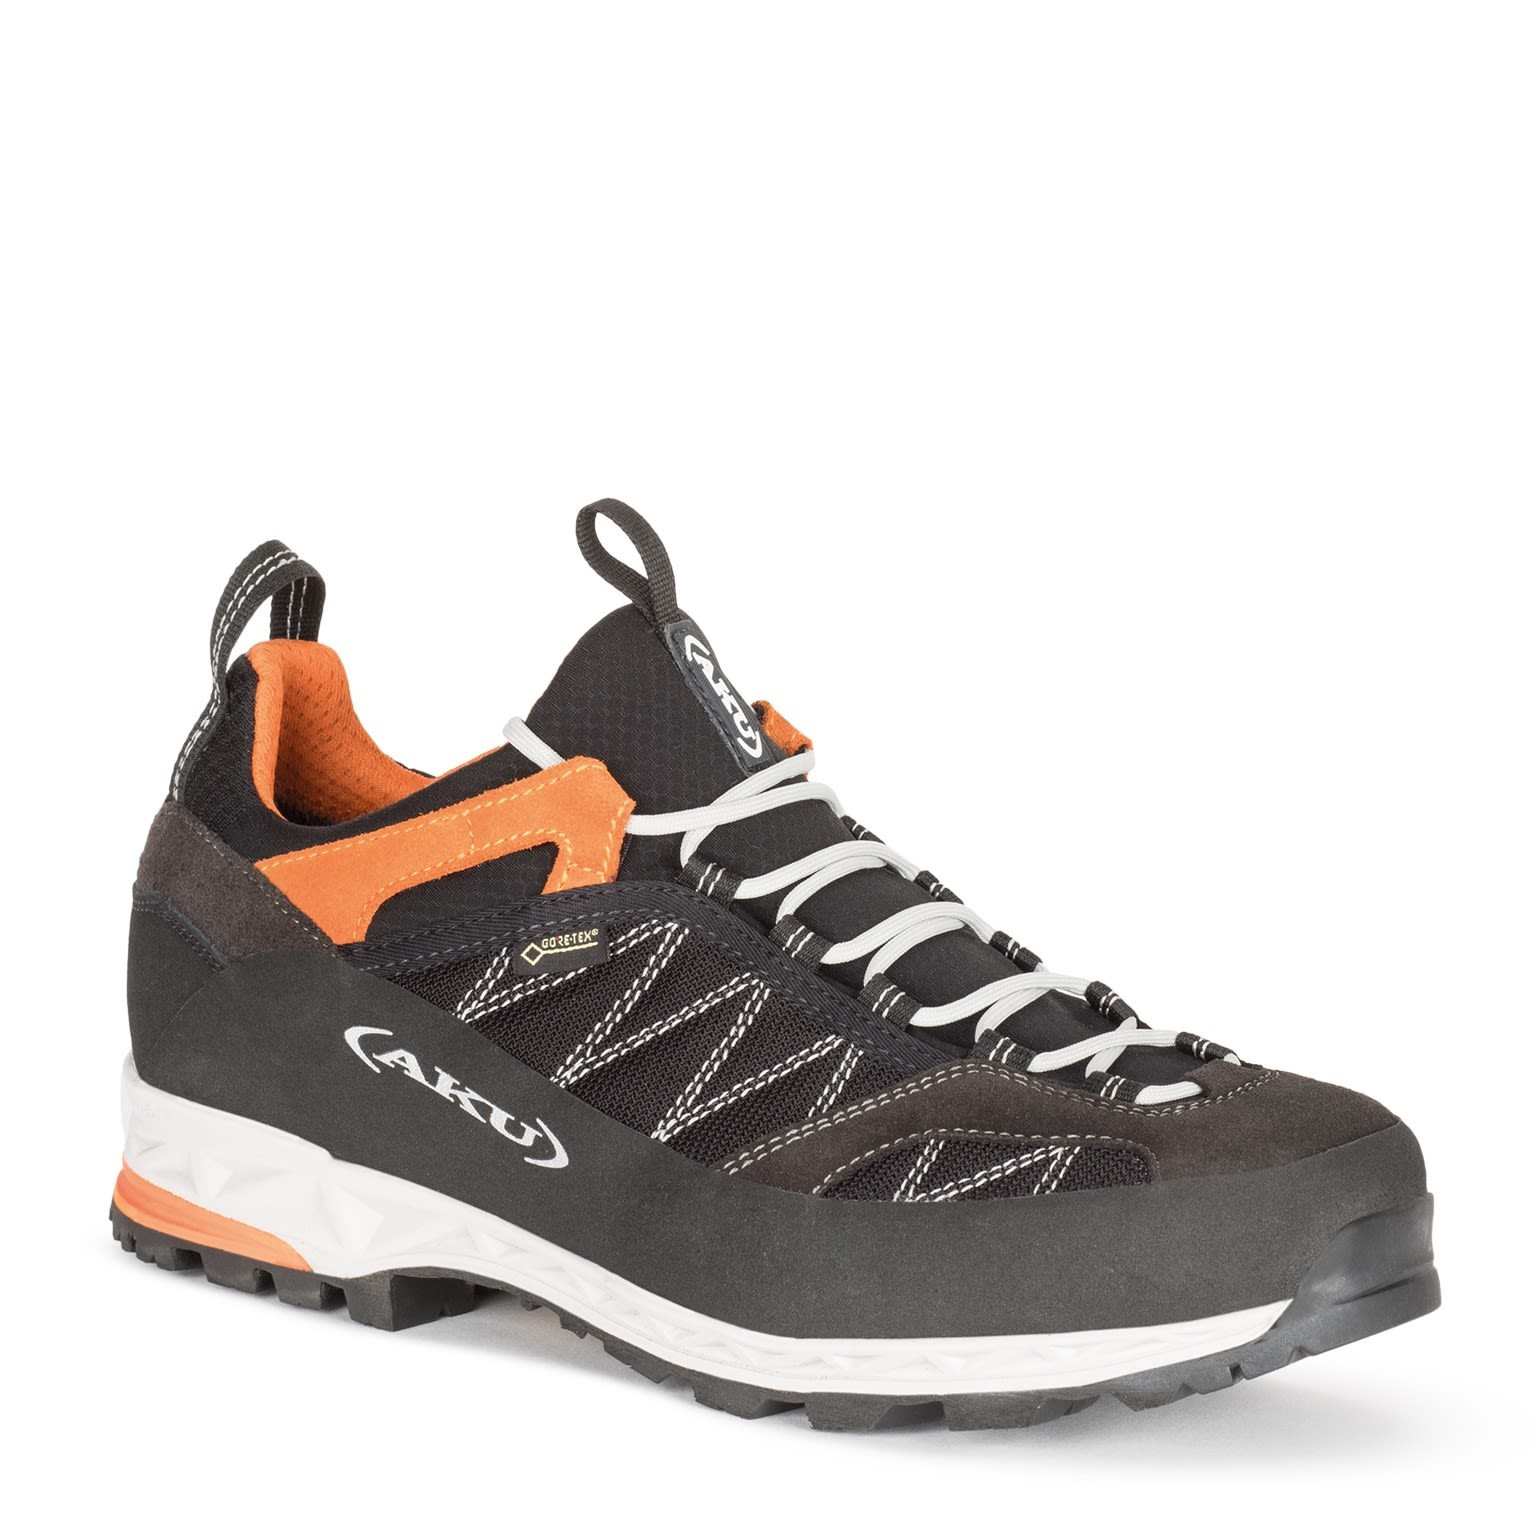 AKU Tengu Low Gtx® Schwarz, Male Gore-Tex® EU 40 -Farbe Schwarz -Orange, 40